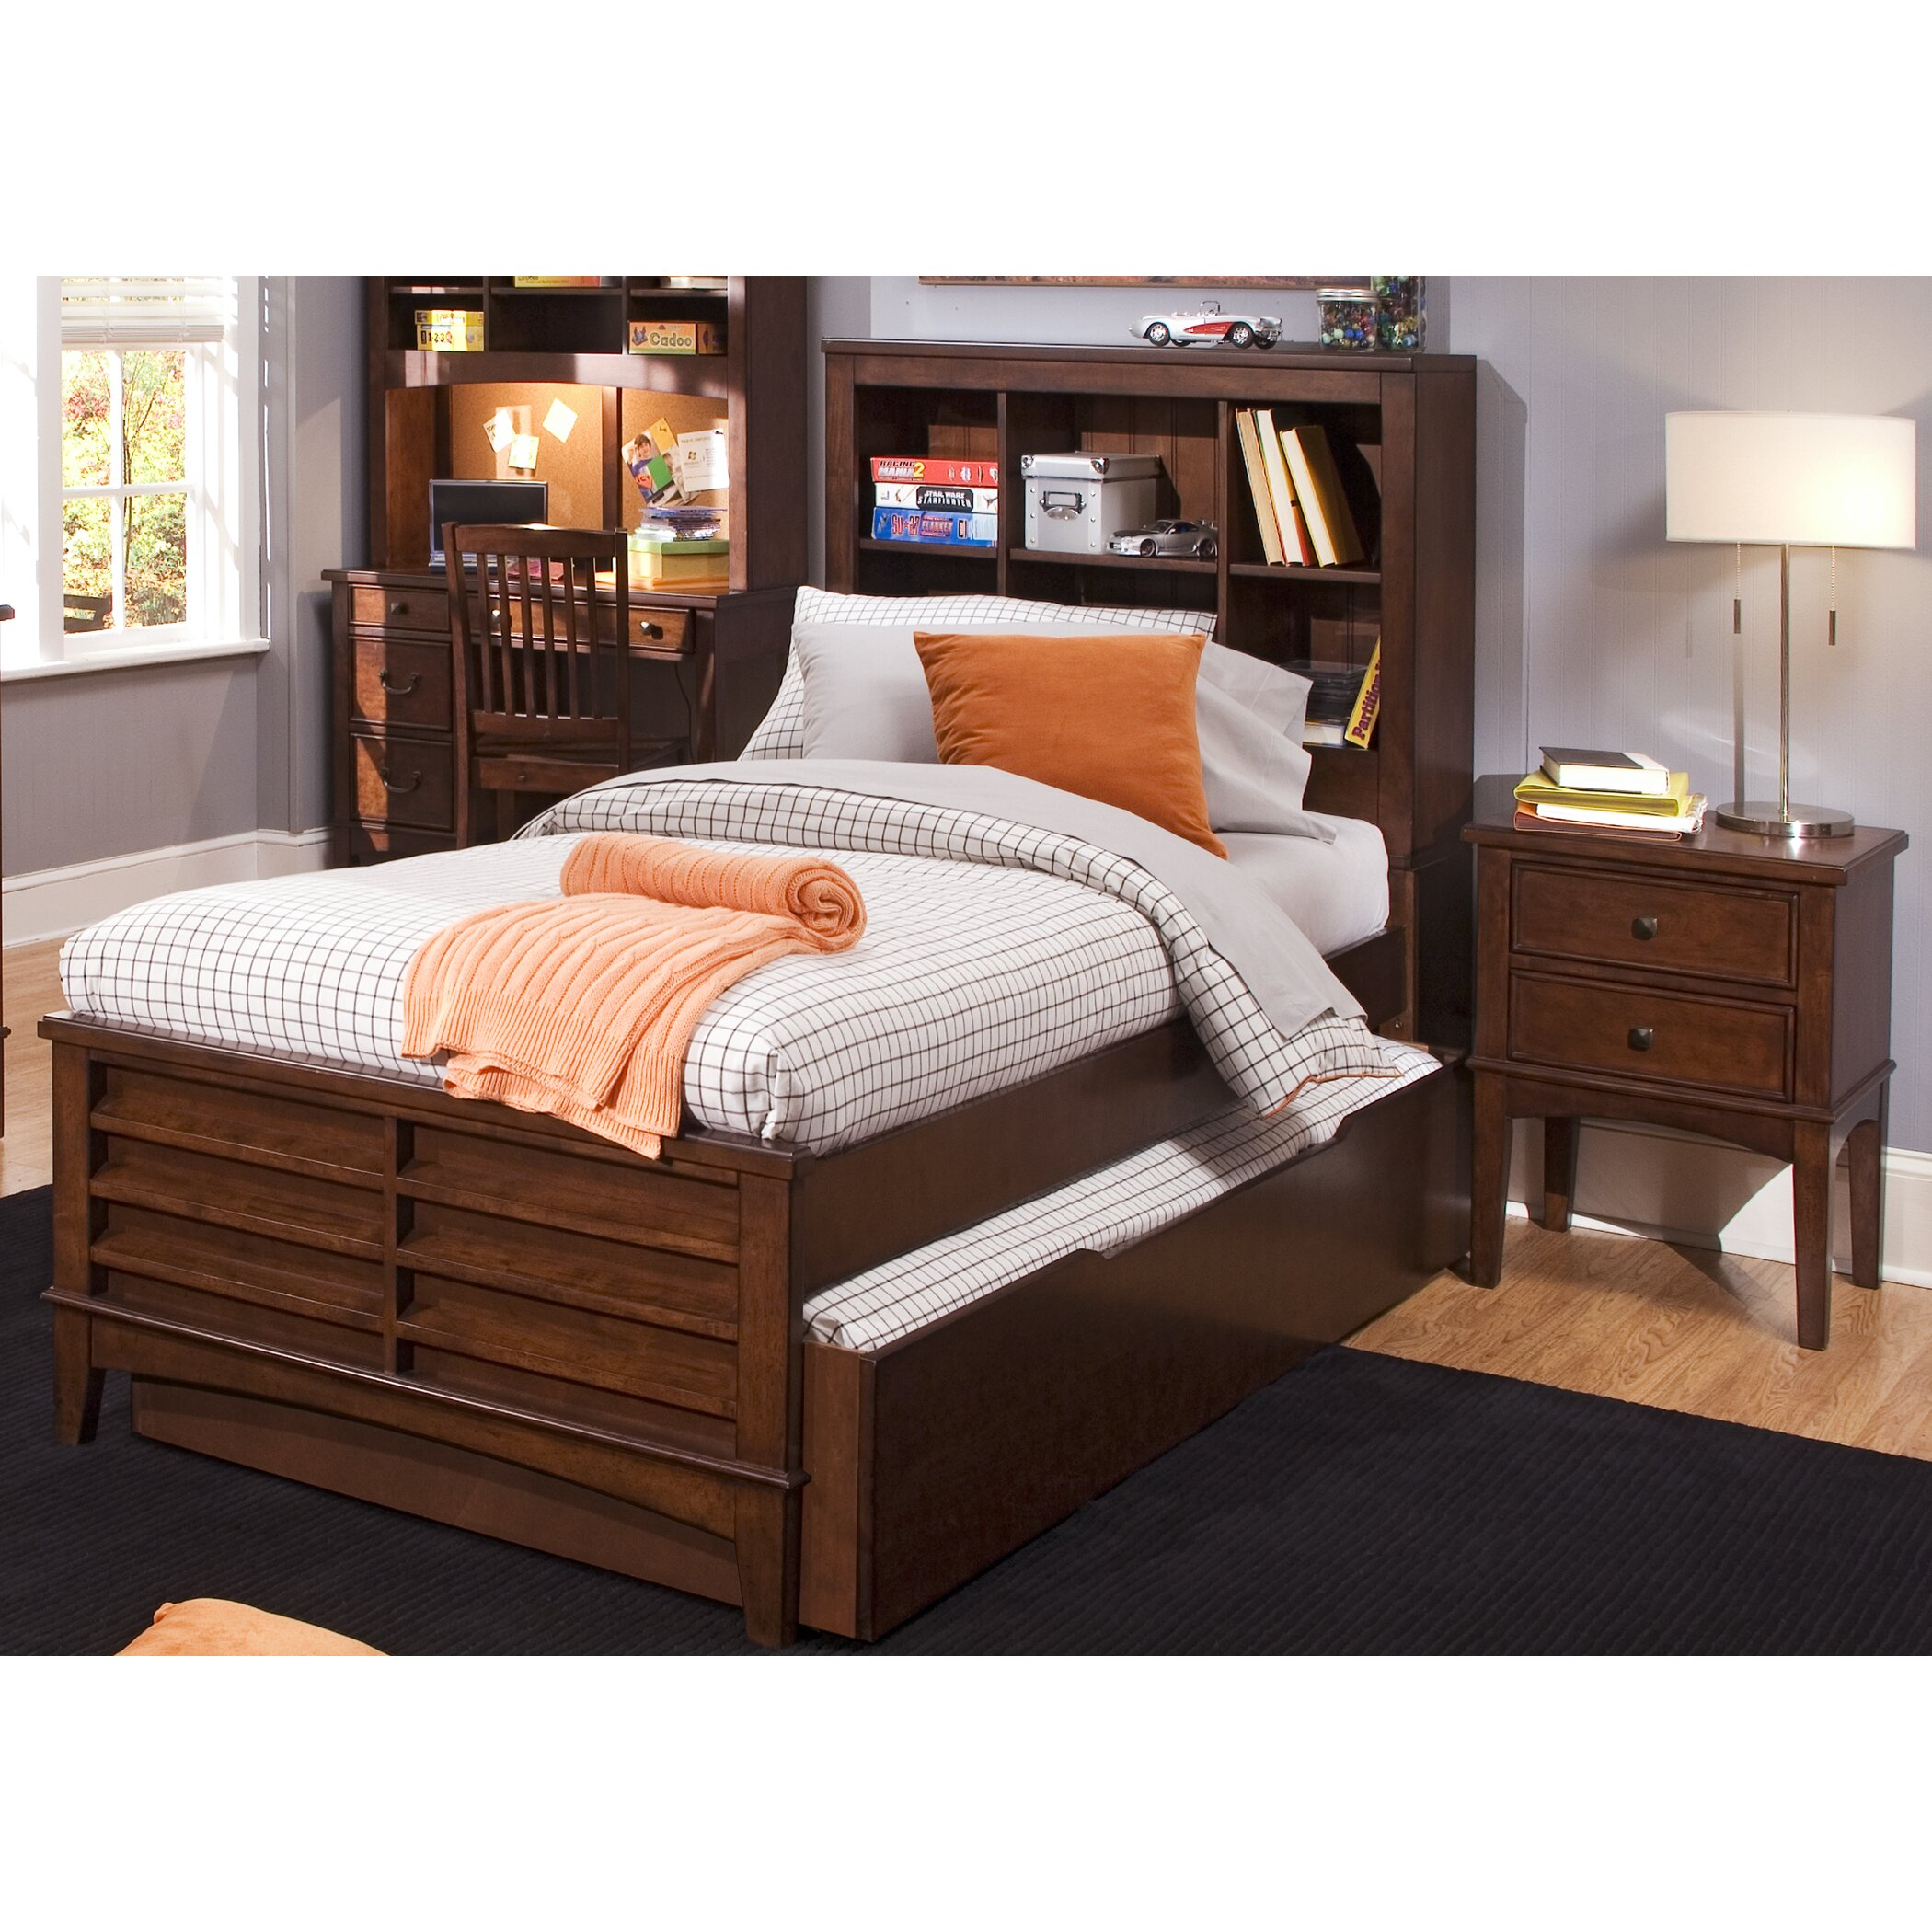 Prepac Bedroom Furniture Modern Design Bedroom Furniture